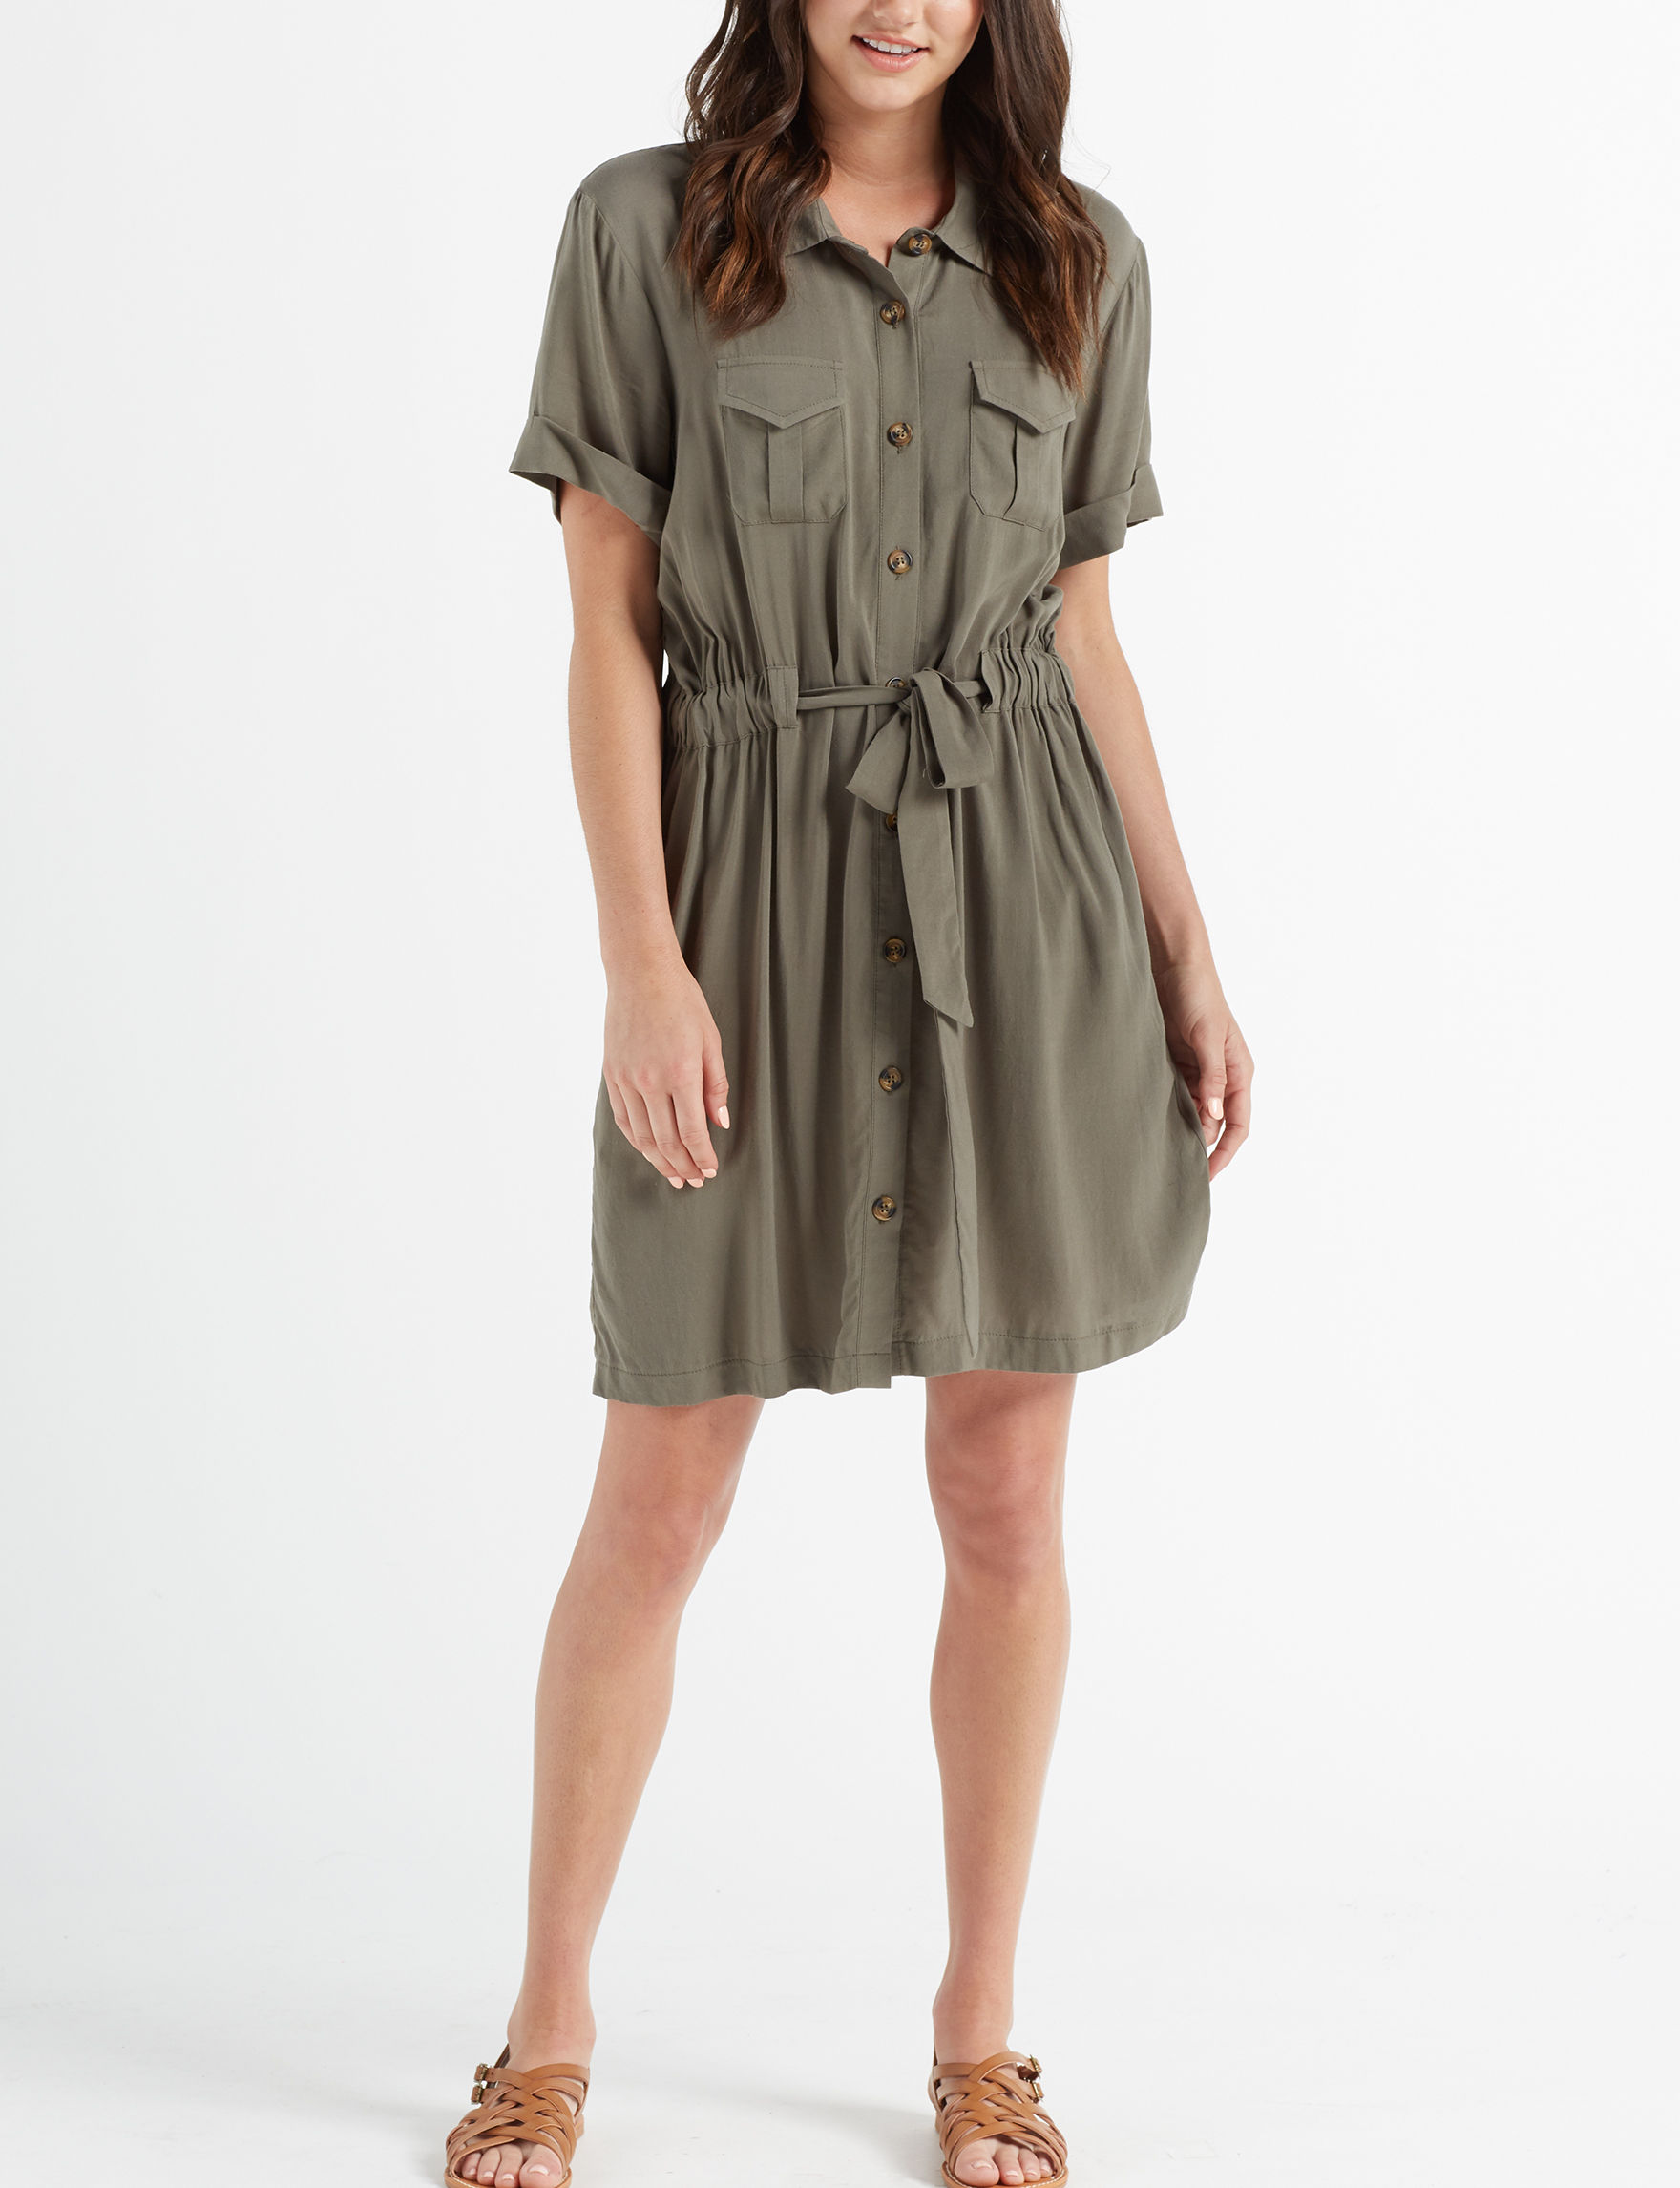 Wishful Park Olive Everyday & Casual Shirt Dresses